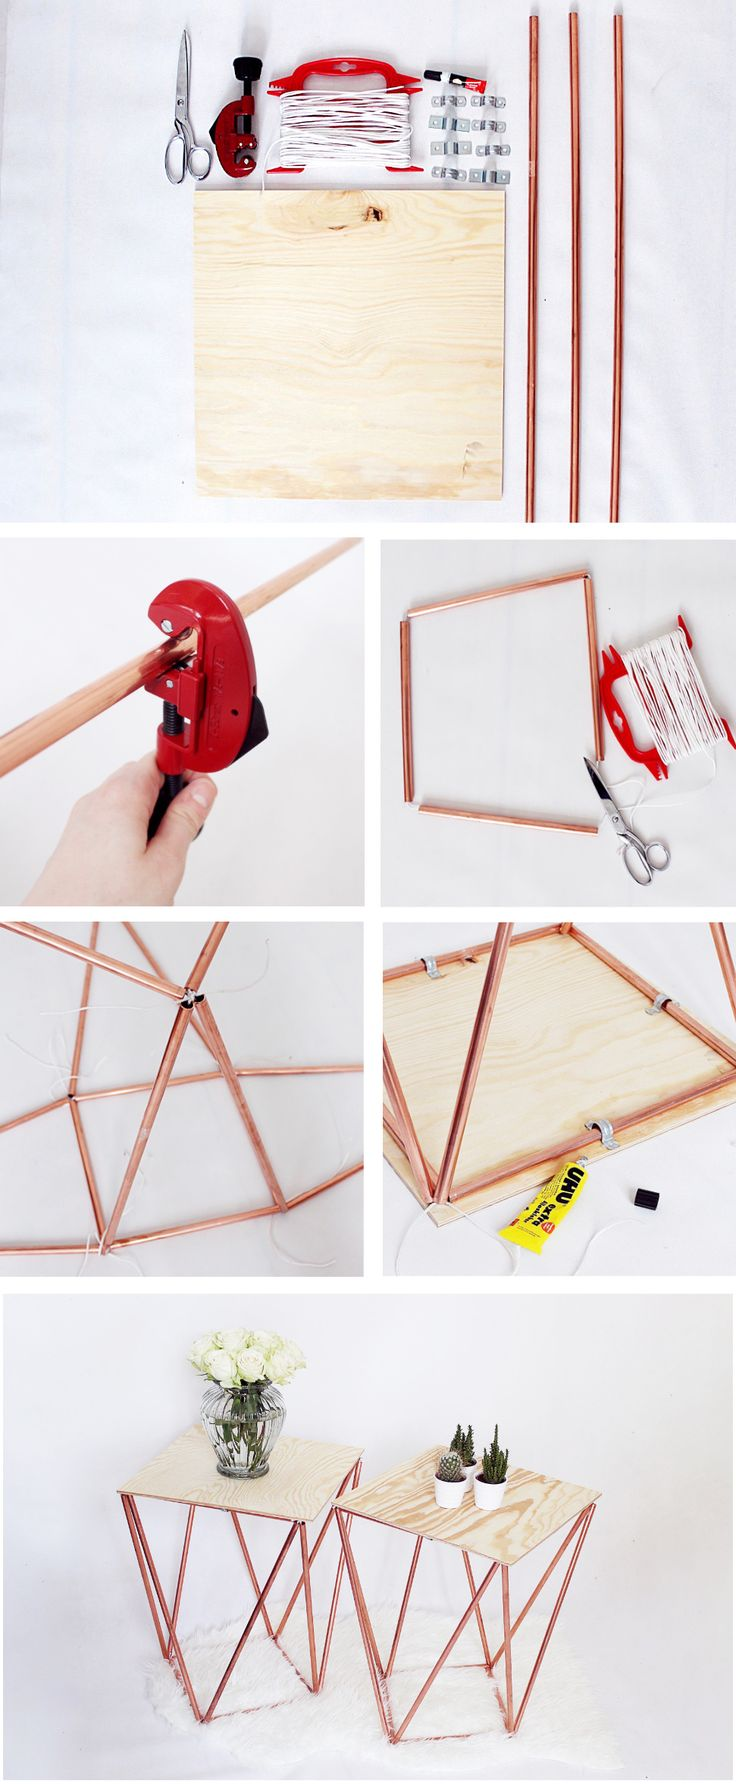 Beistelltisch Selber Bauen- Komplette DIY Anleitung